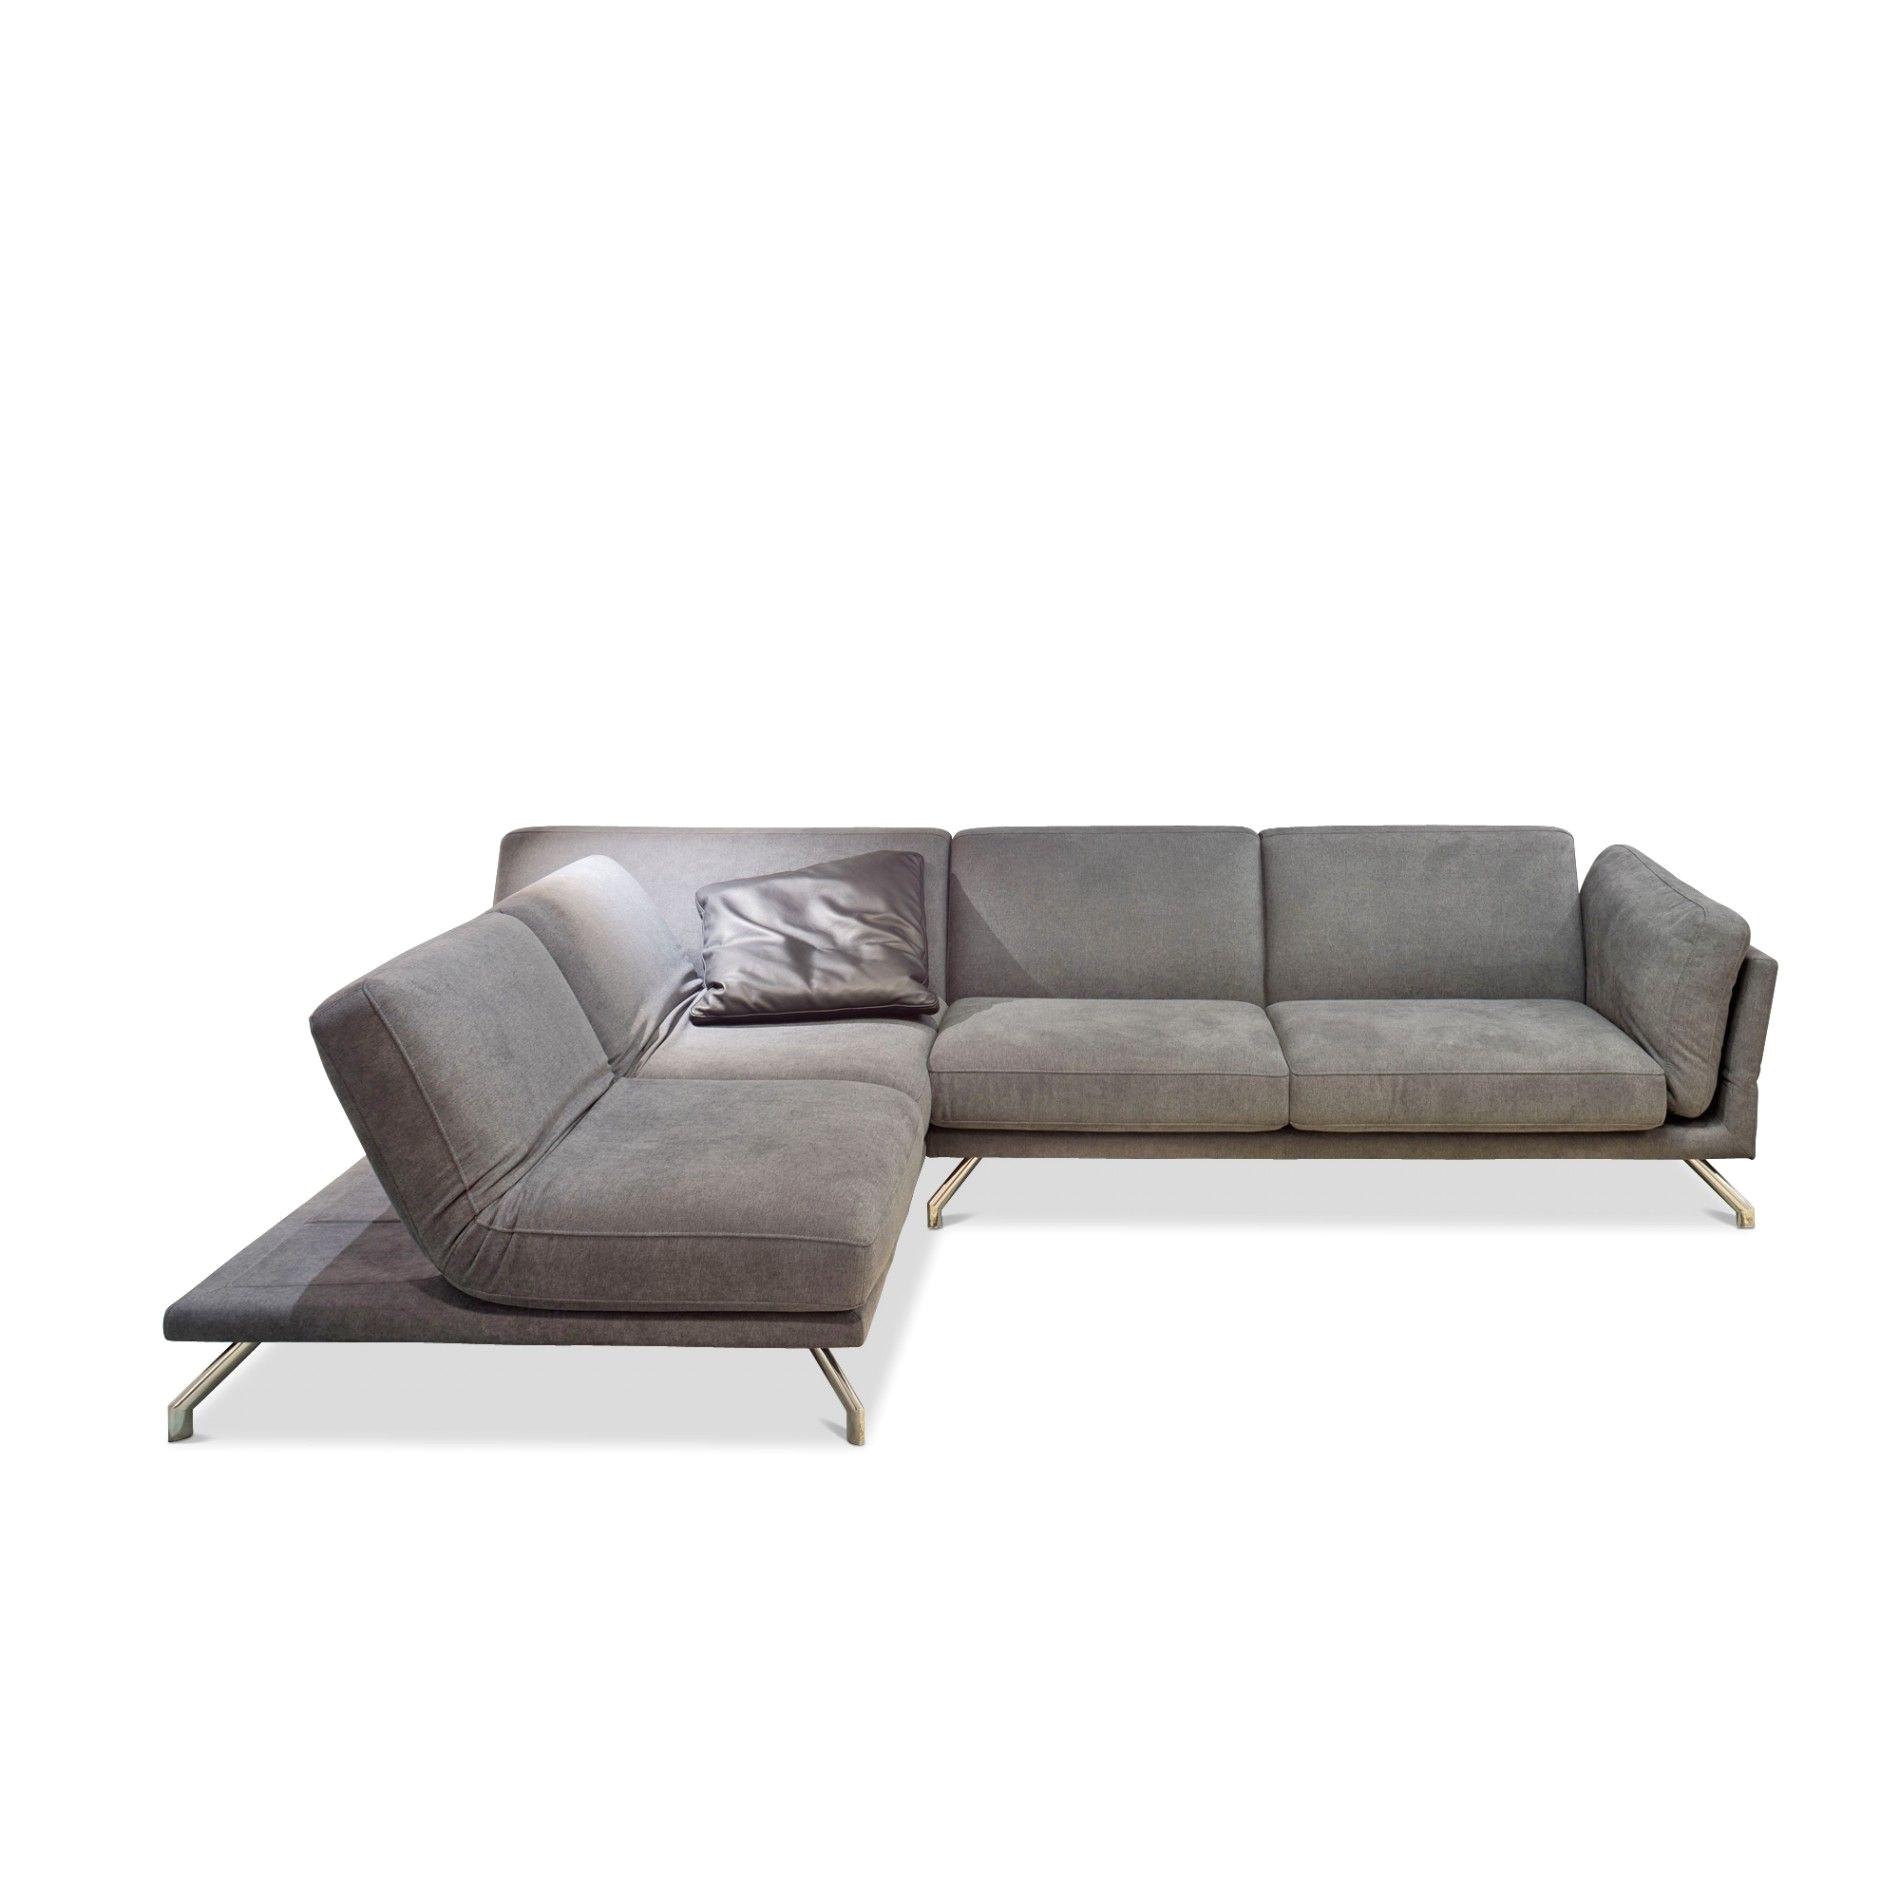 sofas bei ikea luxus luft sofa ikea luxus bmw x3 2 0d 38b64a05 pakanafo stock